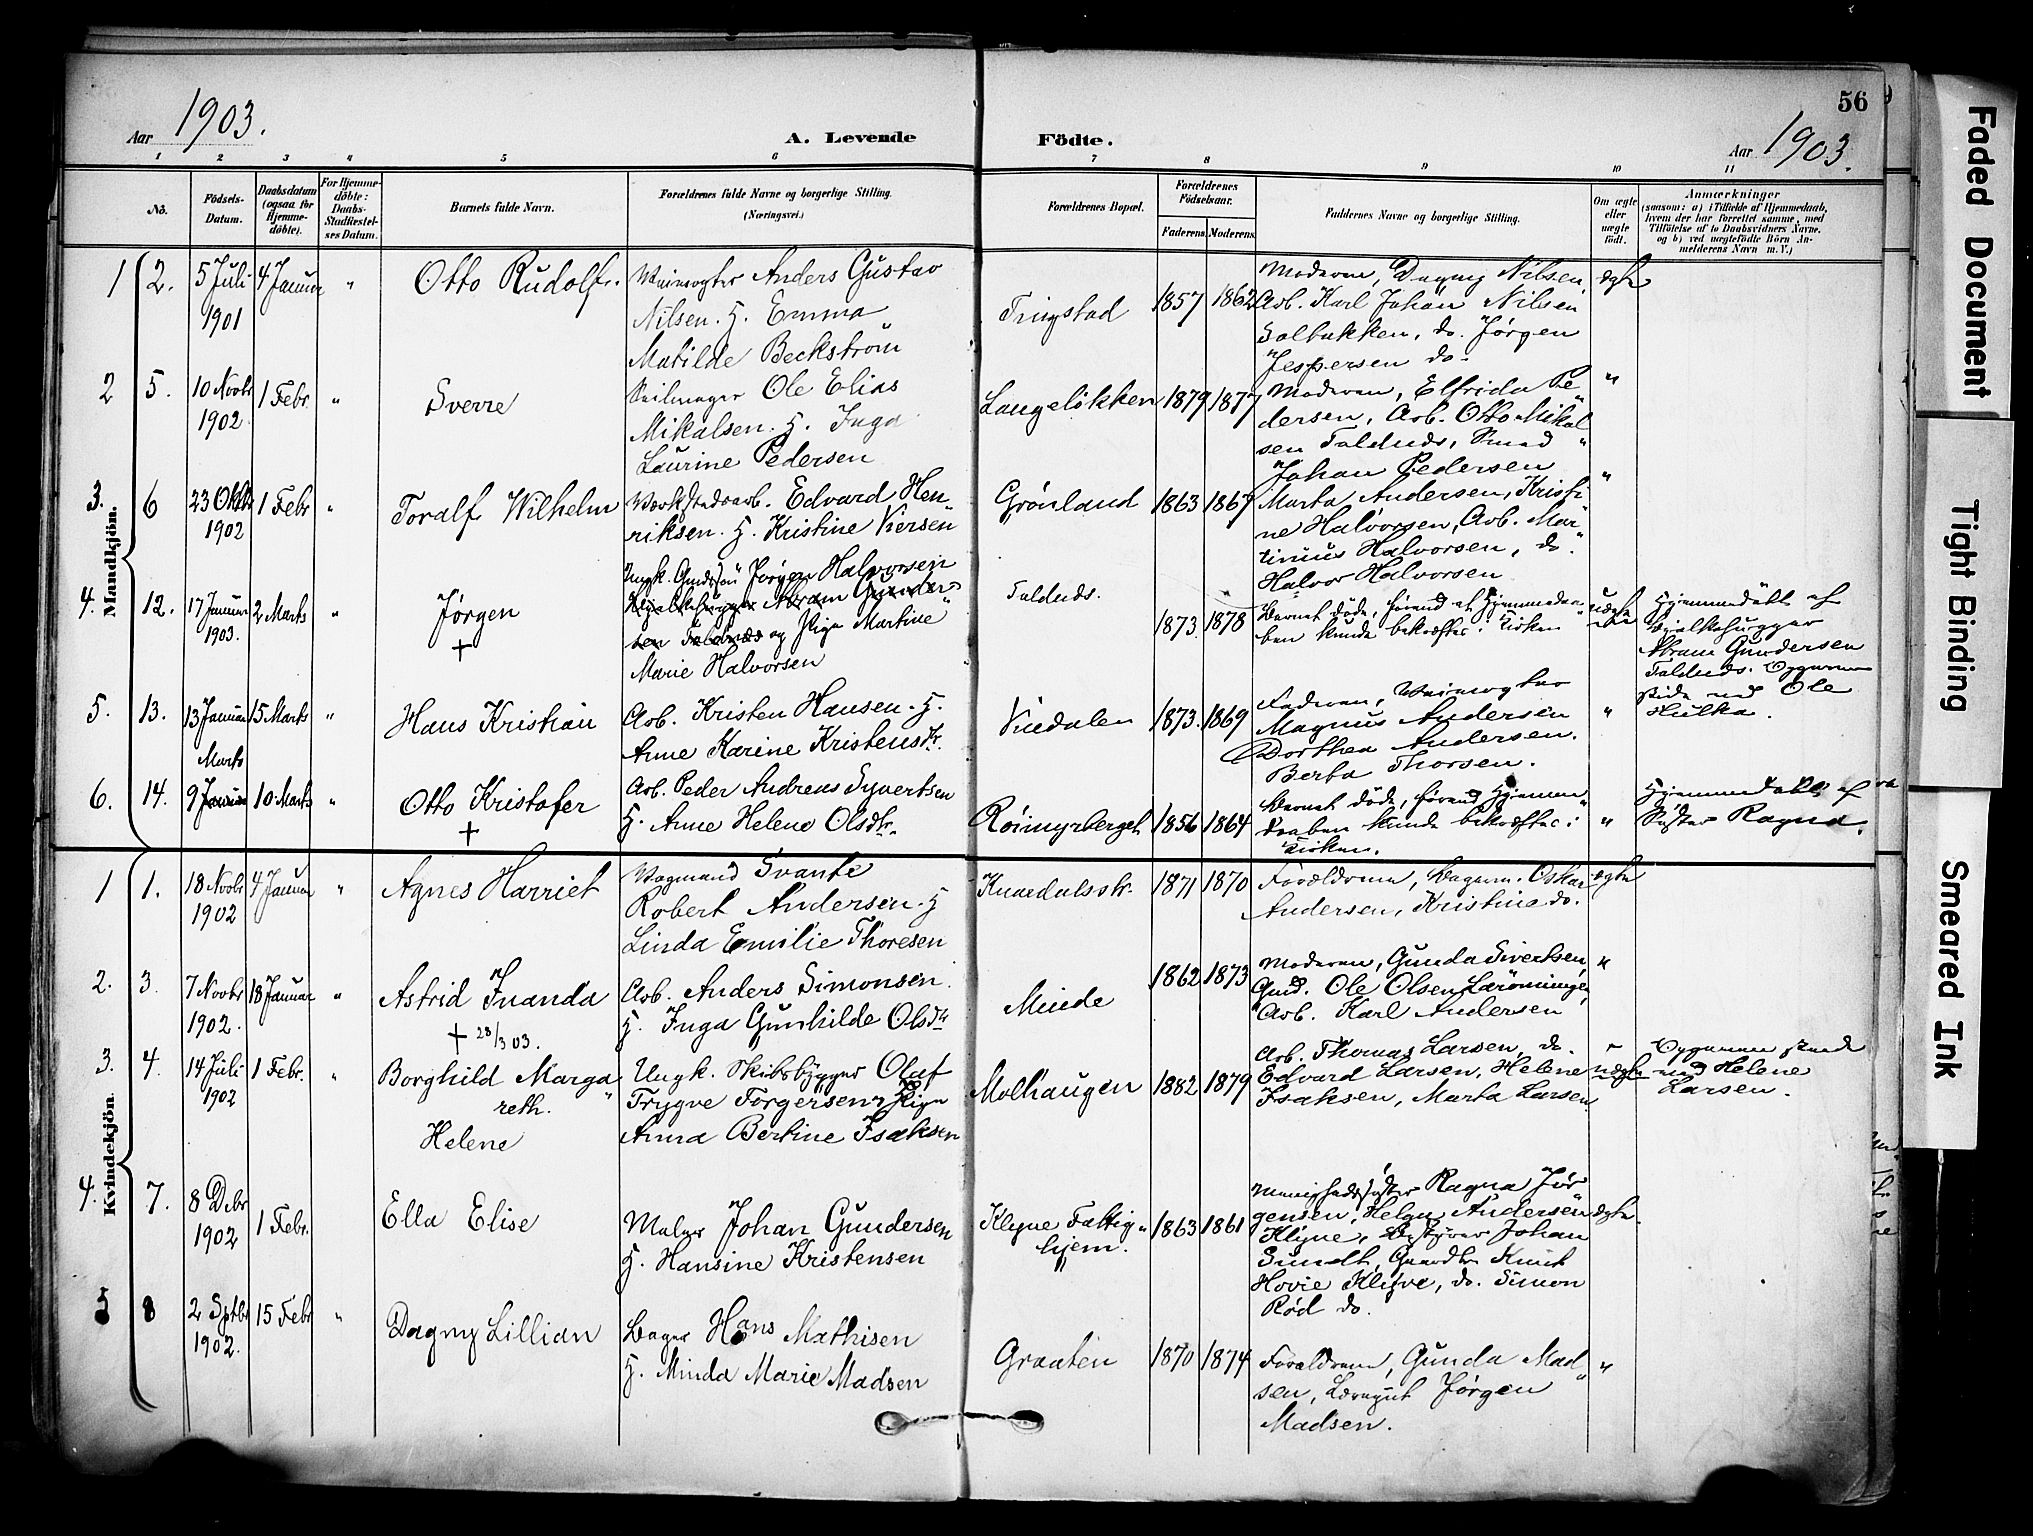 SAKO, Solum kirkebøker, F/Fa/L0011: Ministerialbok nr. I 11, 1898-1909, s. 56